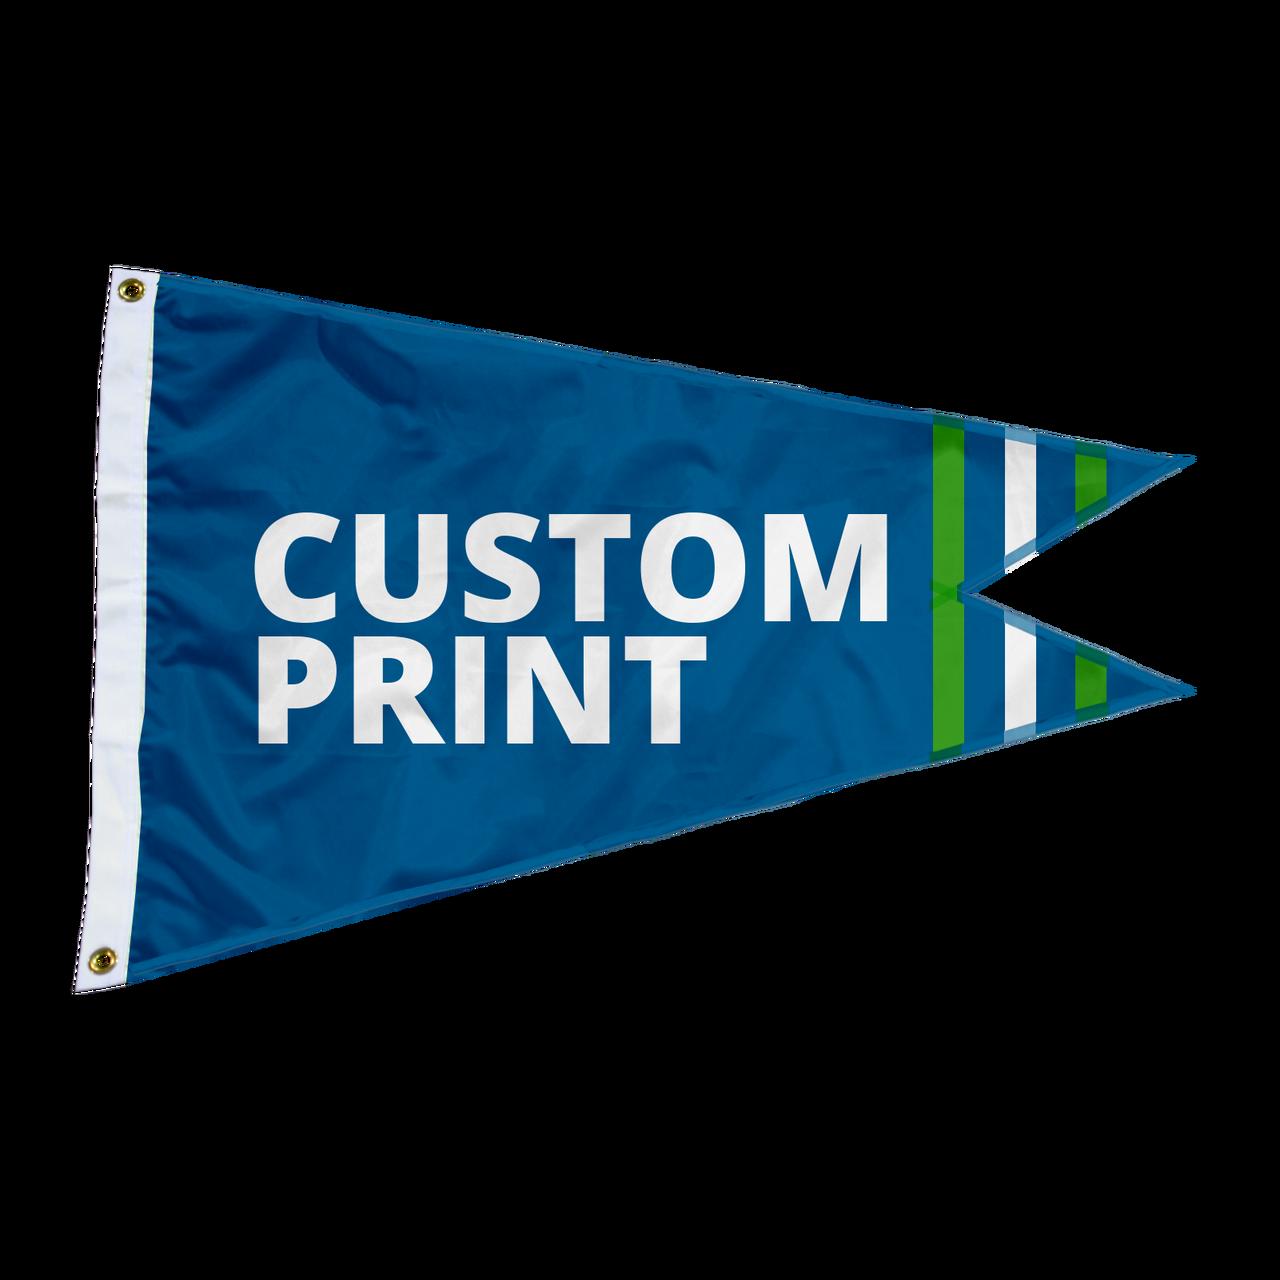 Custom 4'x6' Burgee Flags-Made in USA